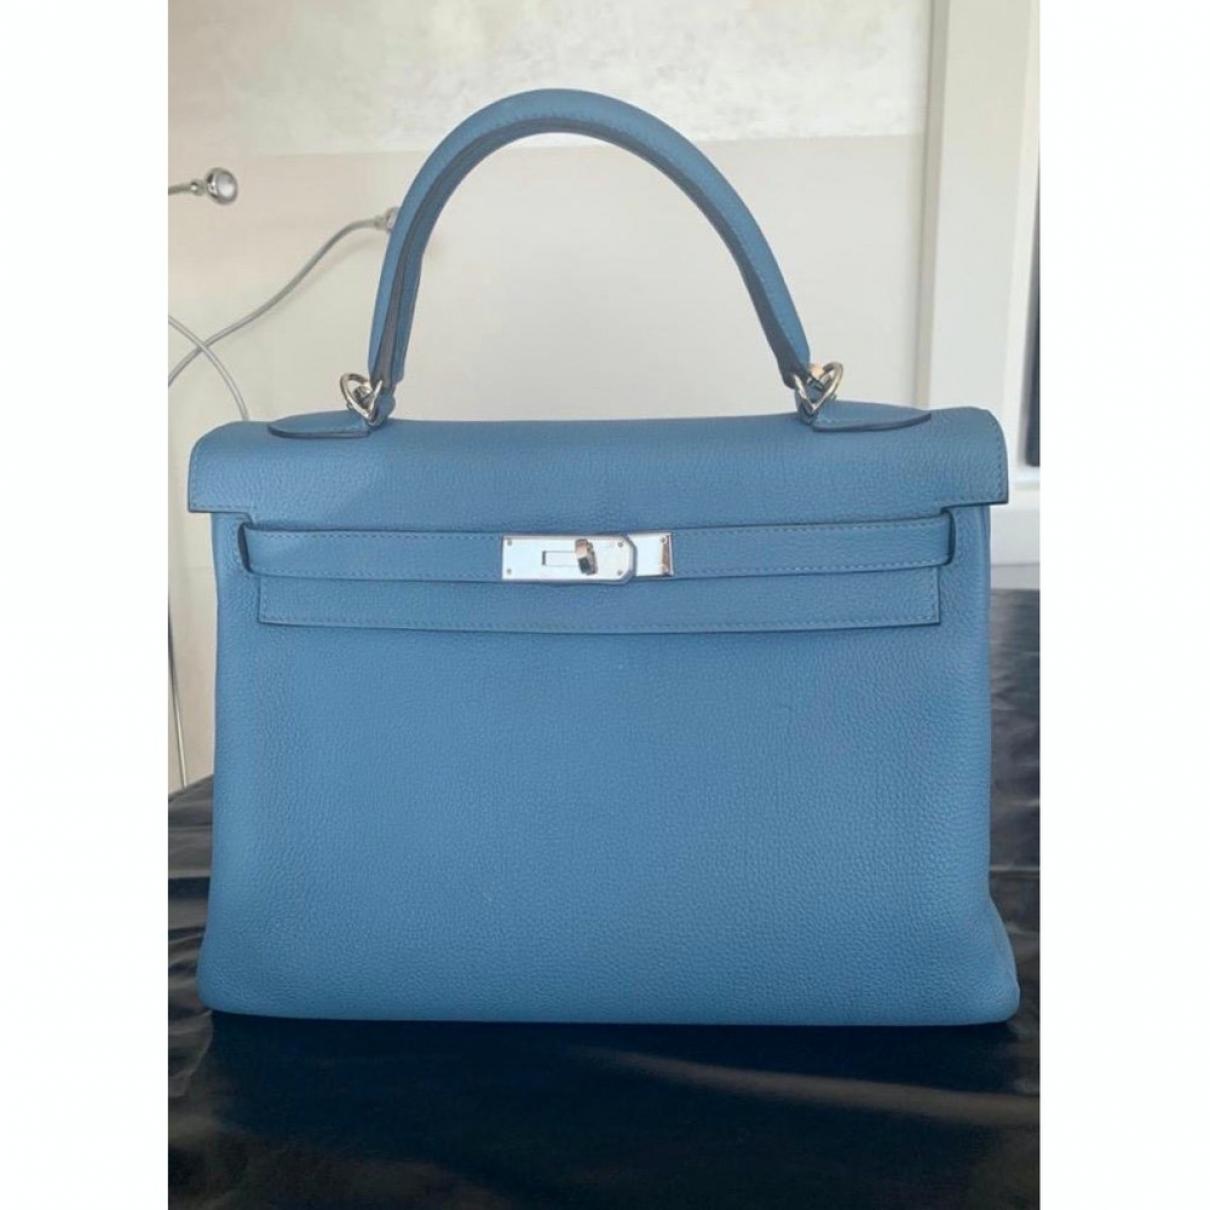 Hermes Kelly 32 Handtasche in  Blau Leder